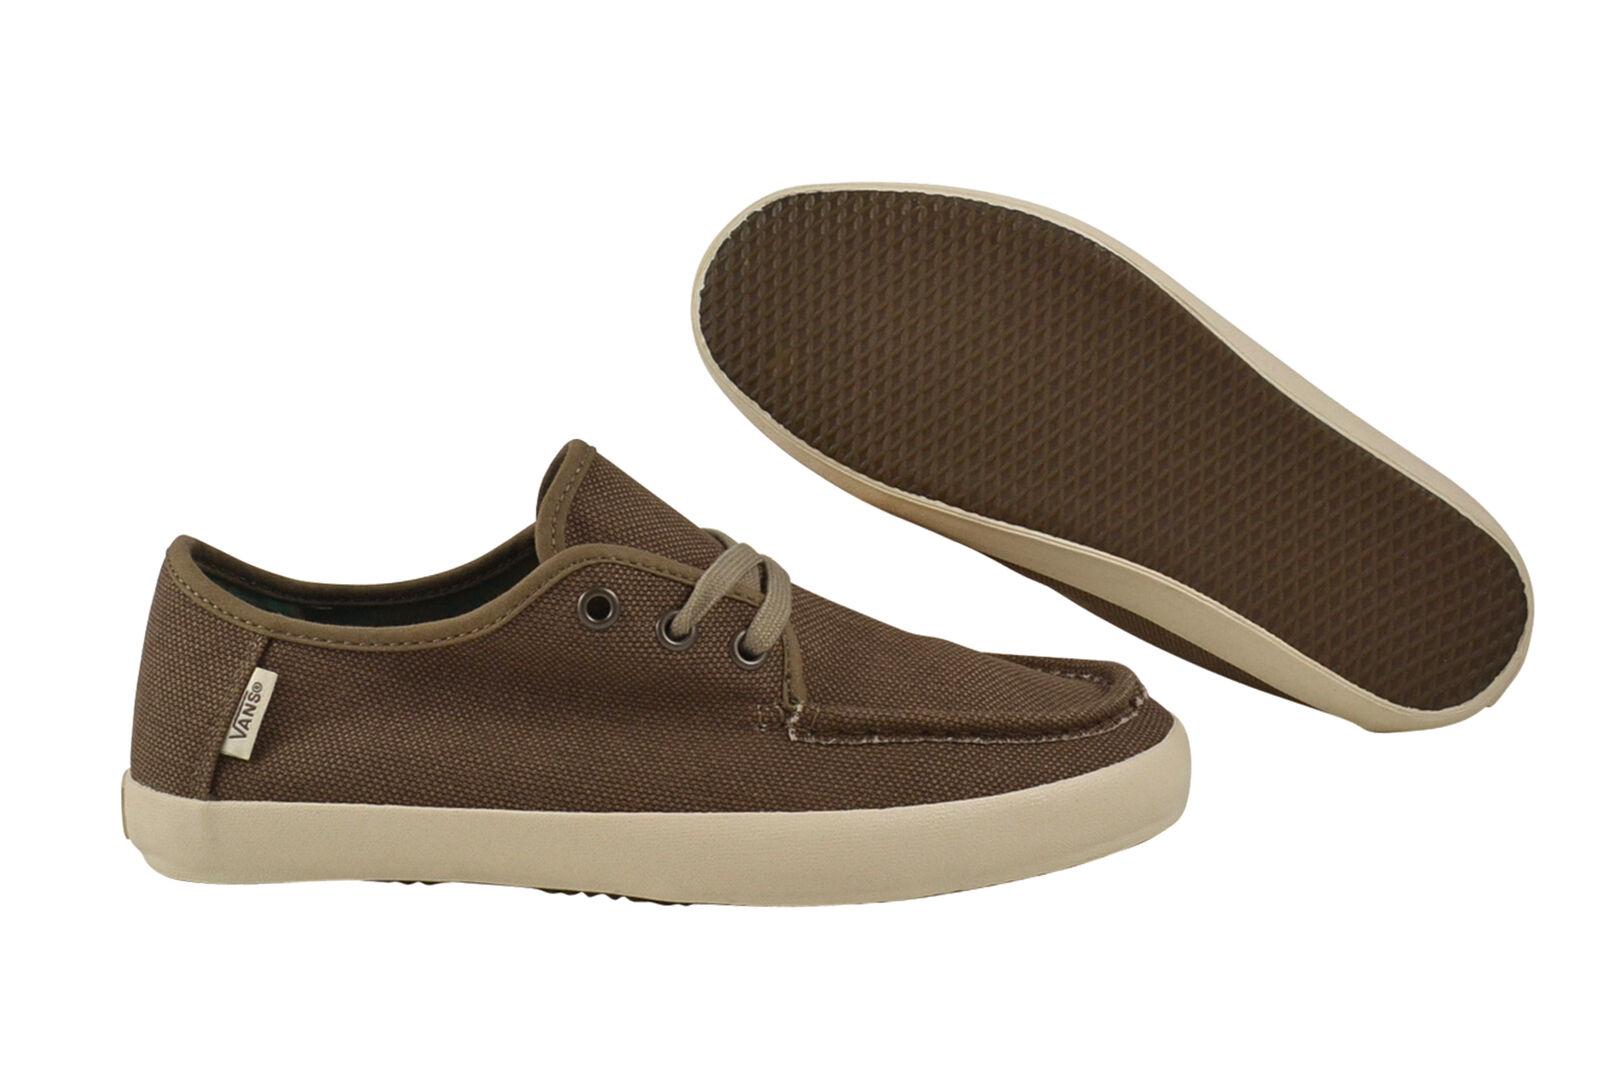 Vans Washboard Sneaker/Schuhe shitake Sneaker/Schuhe Washboard UCWCGZ braun 4d1a90